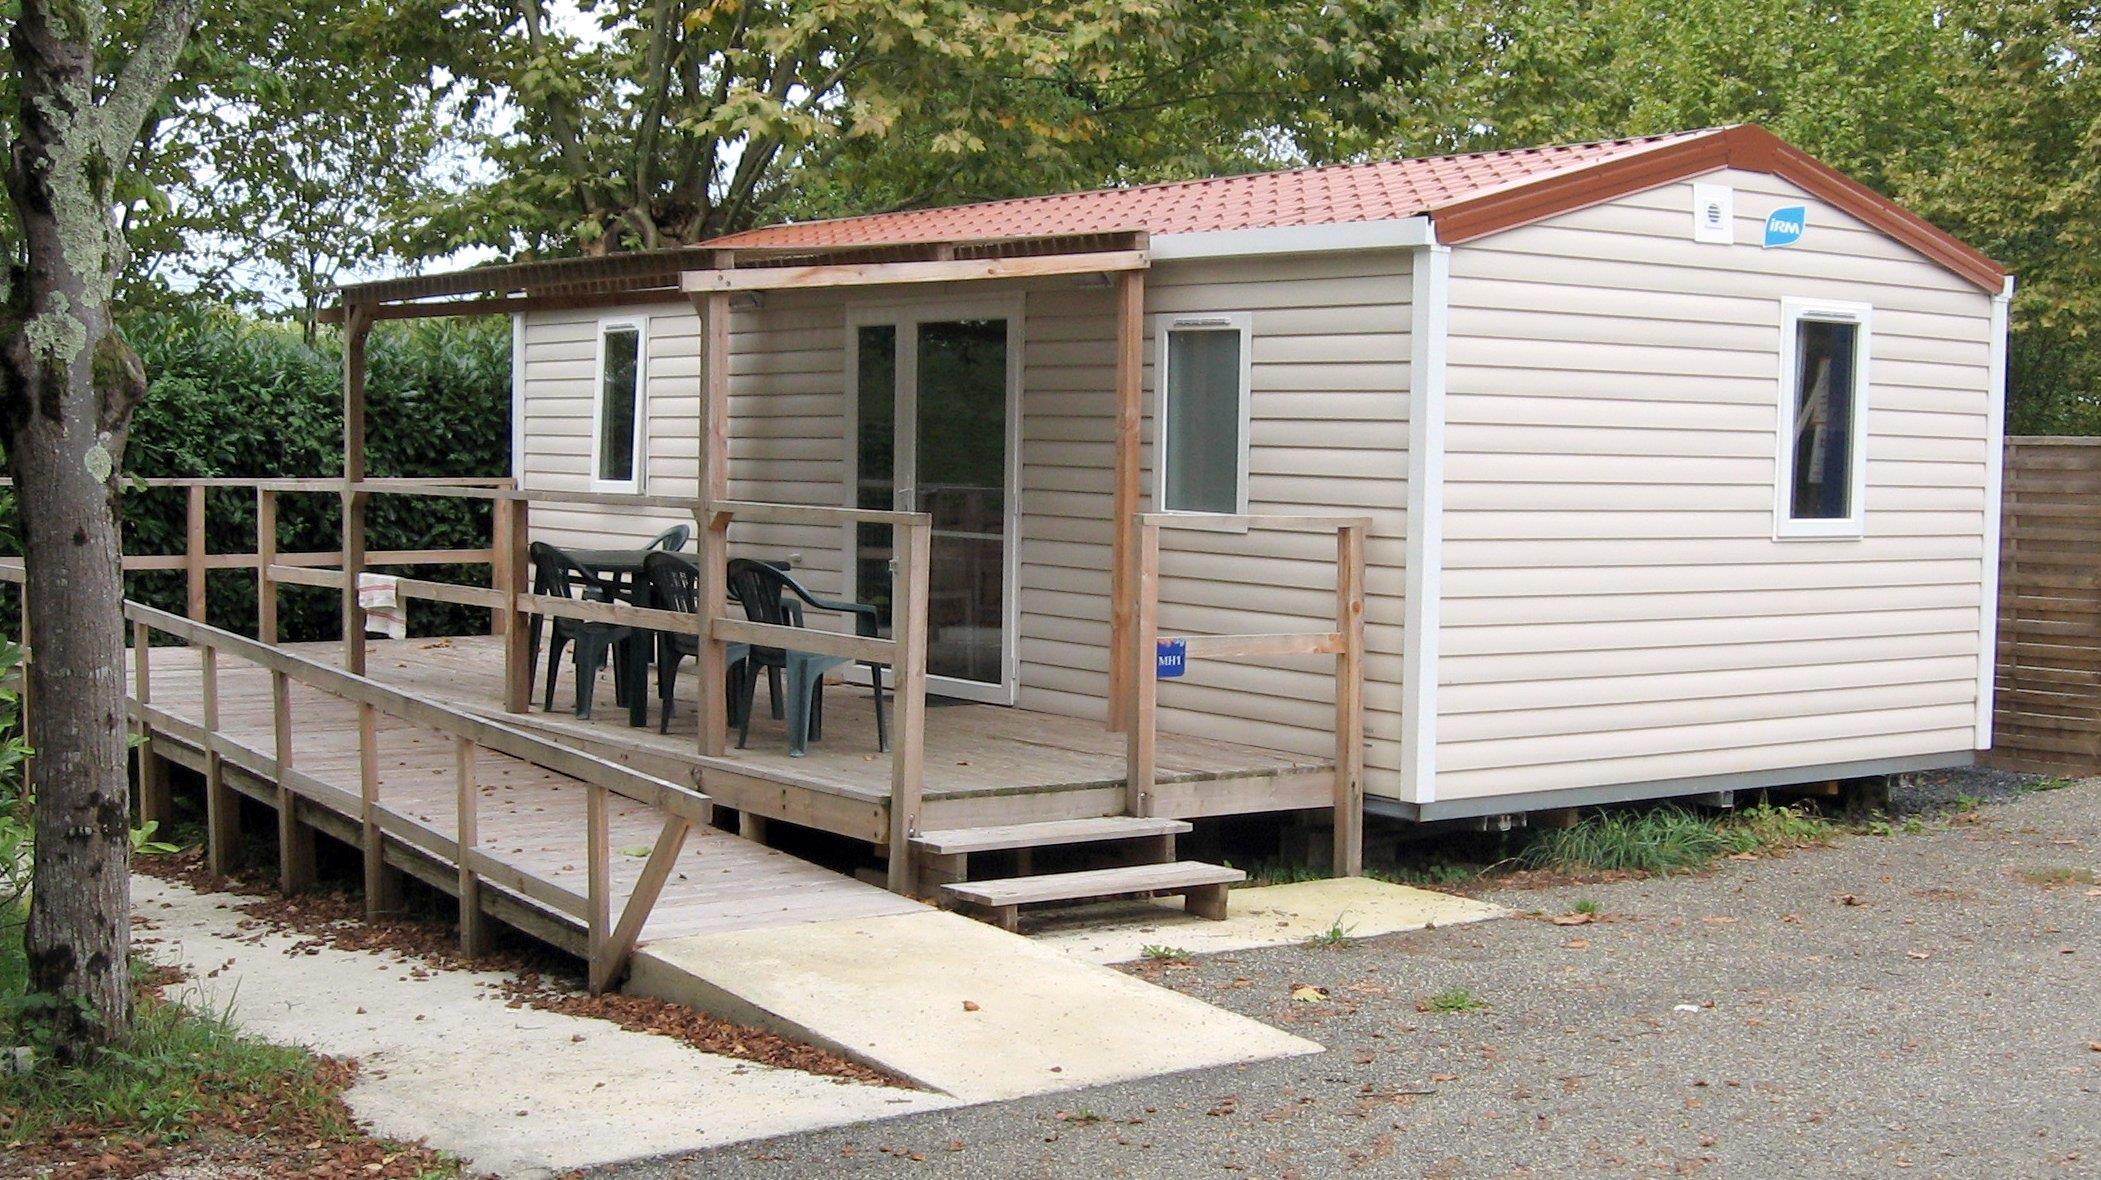 Location - Mobile Home Pmr Confort + 30M² (2 Chambres) + Terrasse Couverte - Camping du Lac